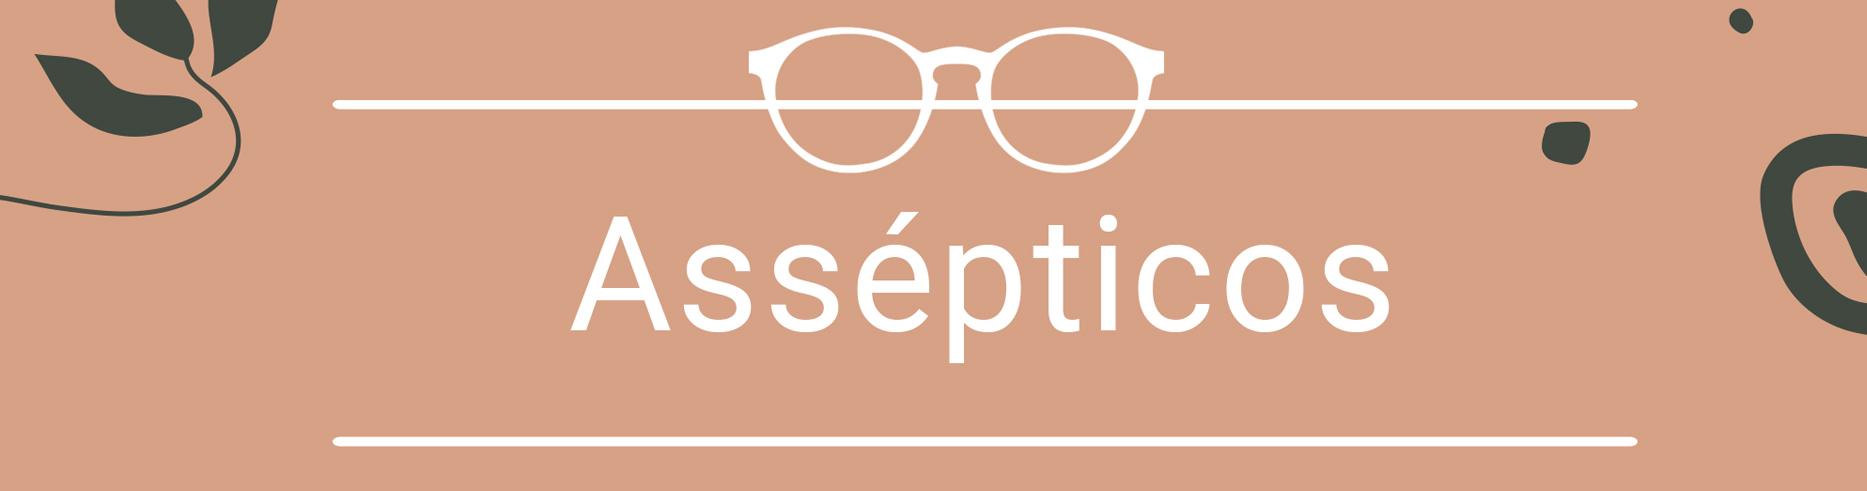 assepticos